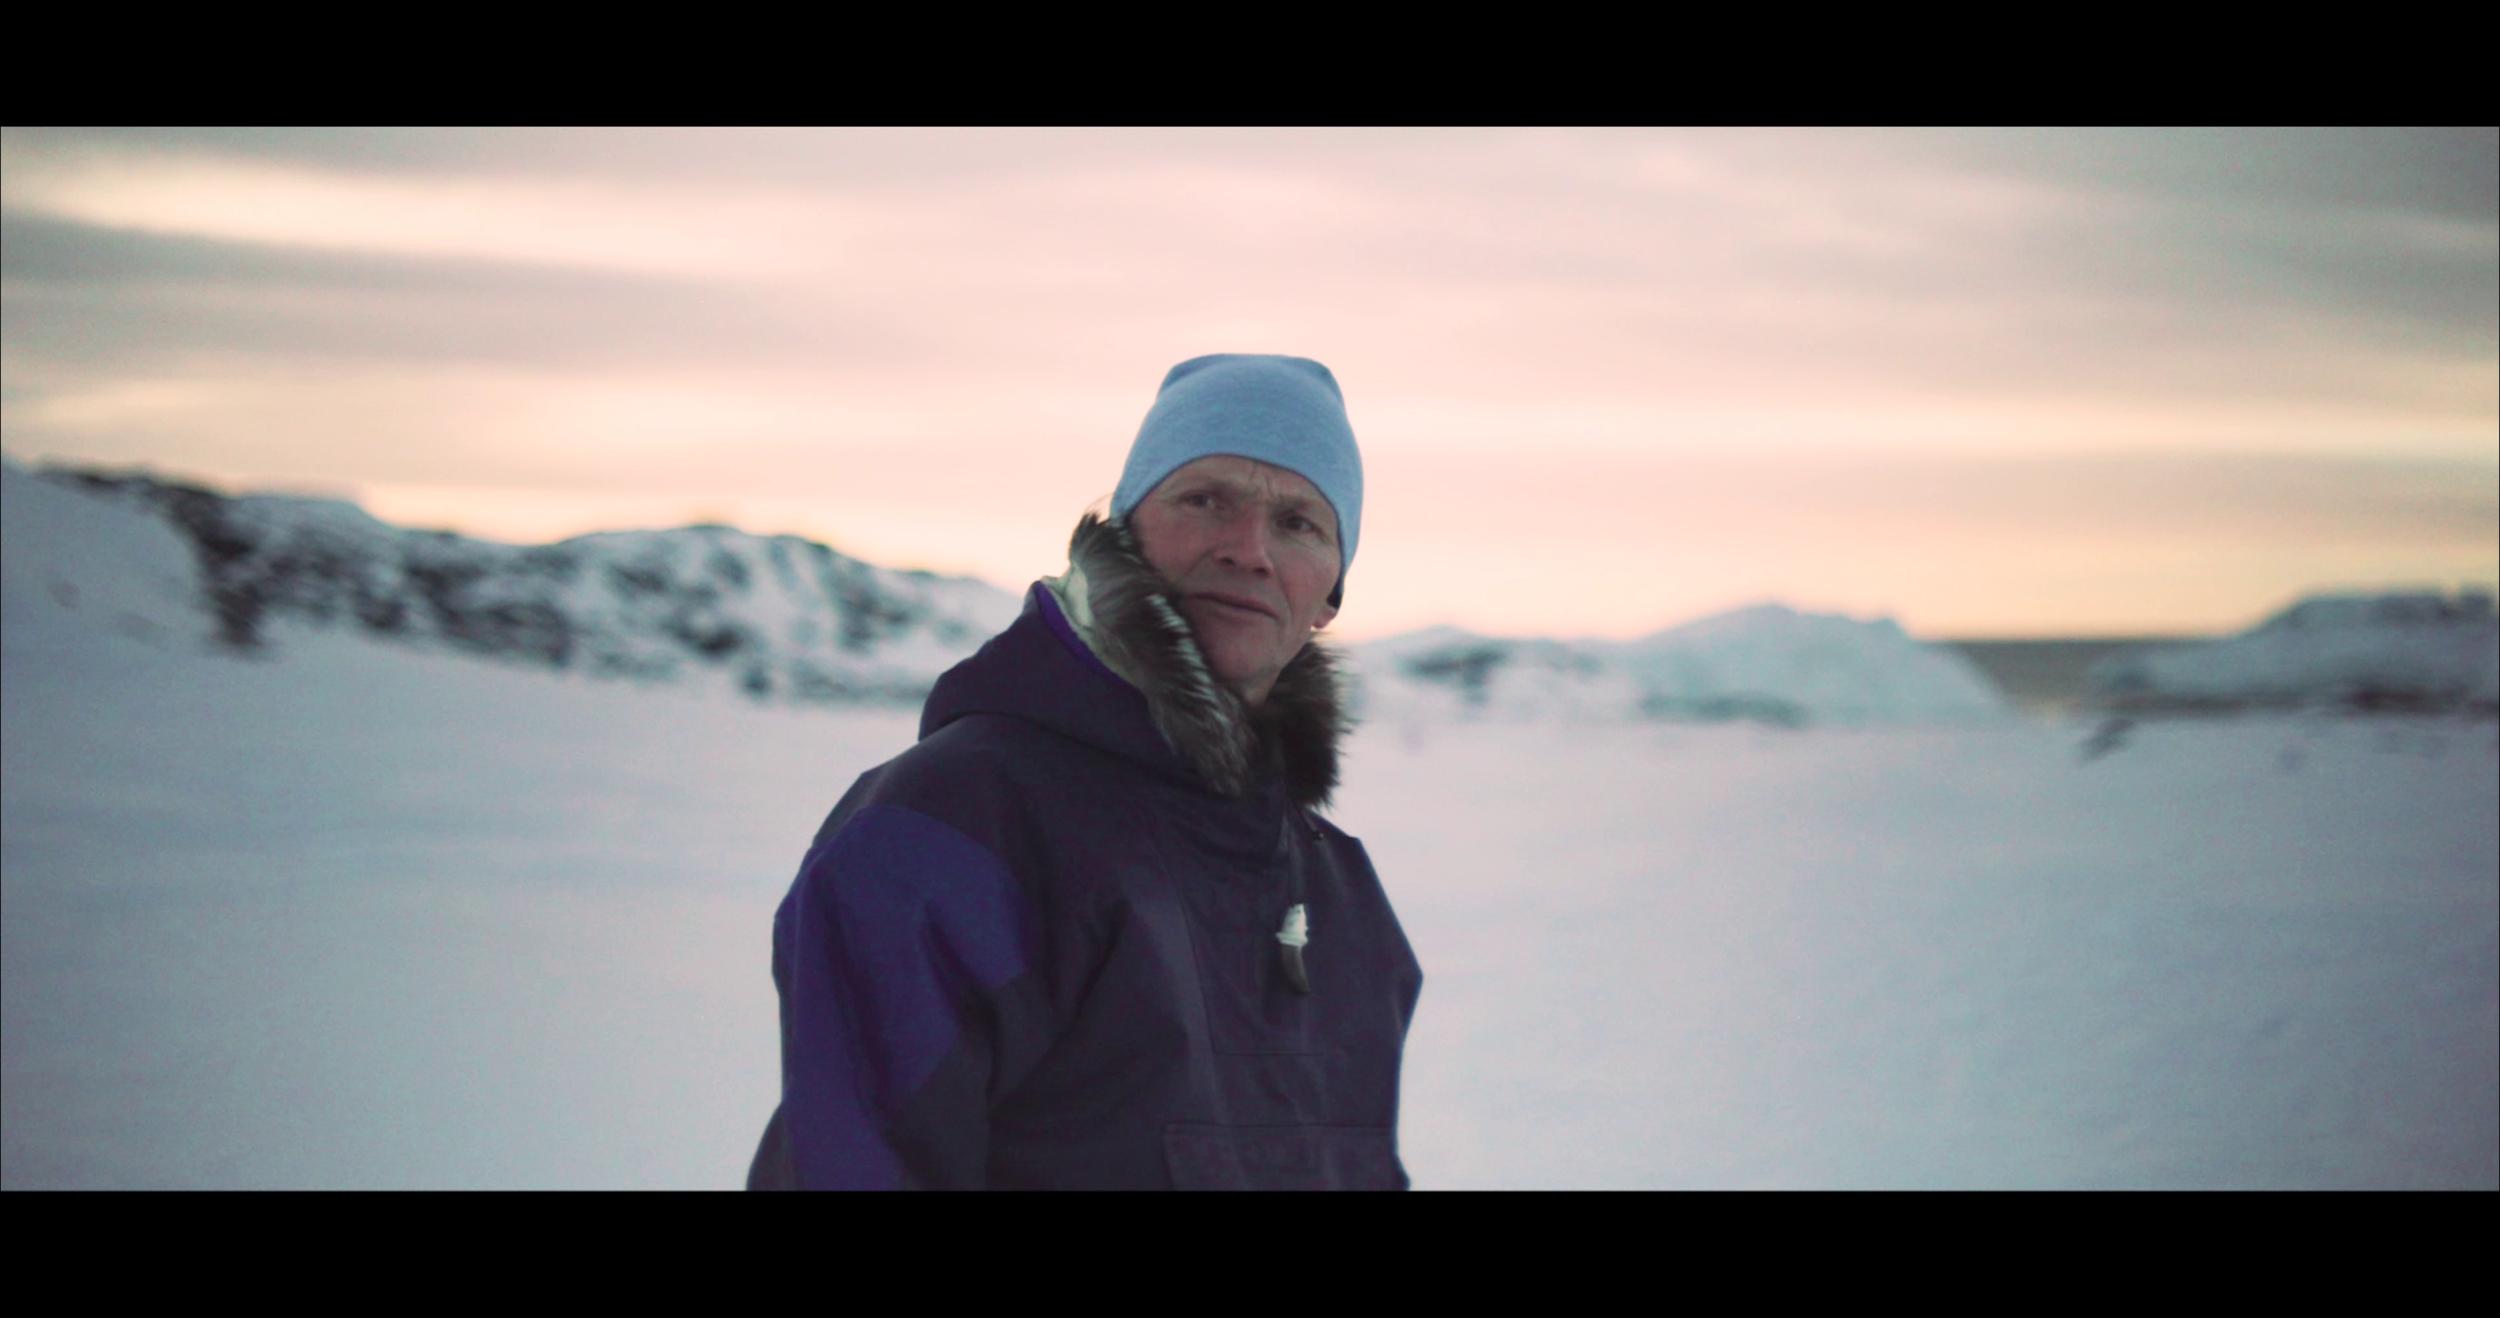 Angut utoqqaq (Old man) Actor: Jørgen Kristensen